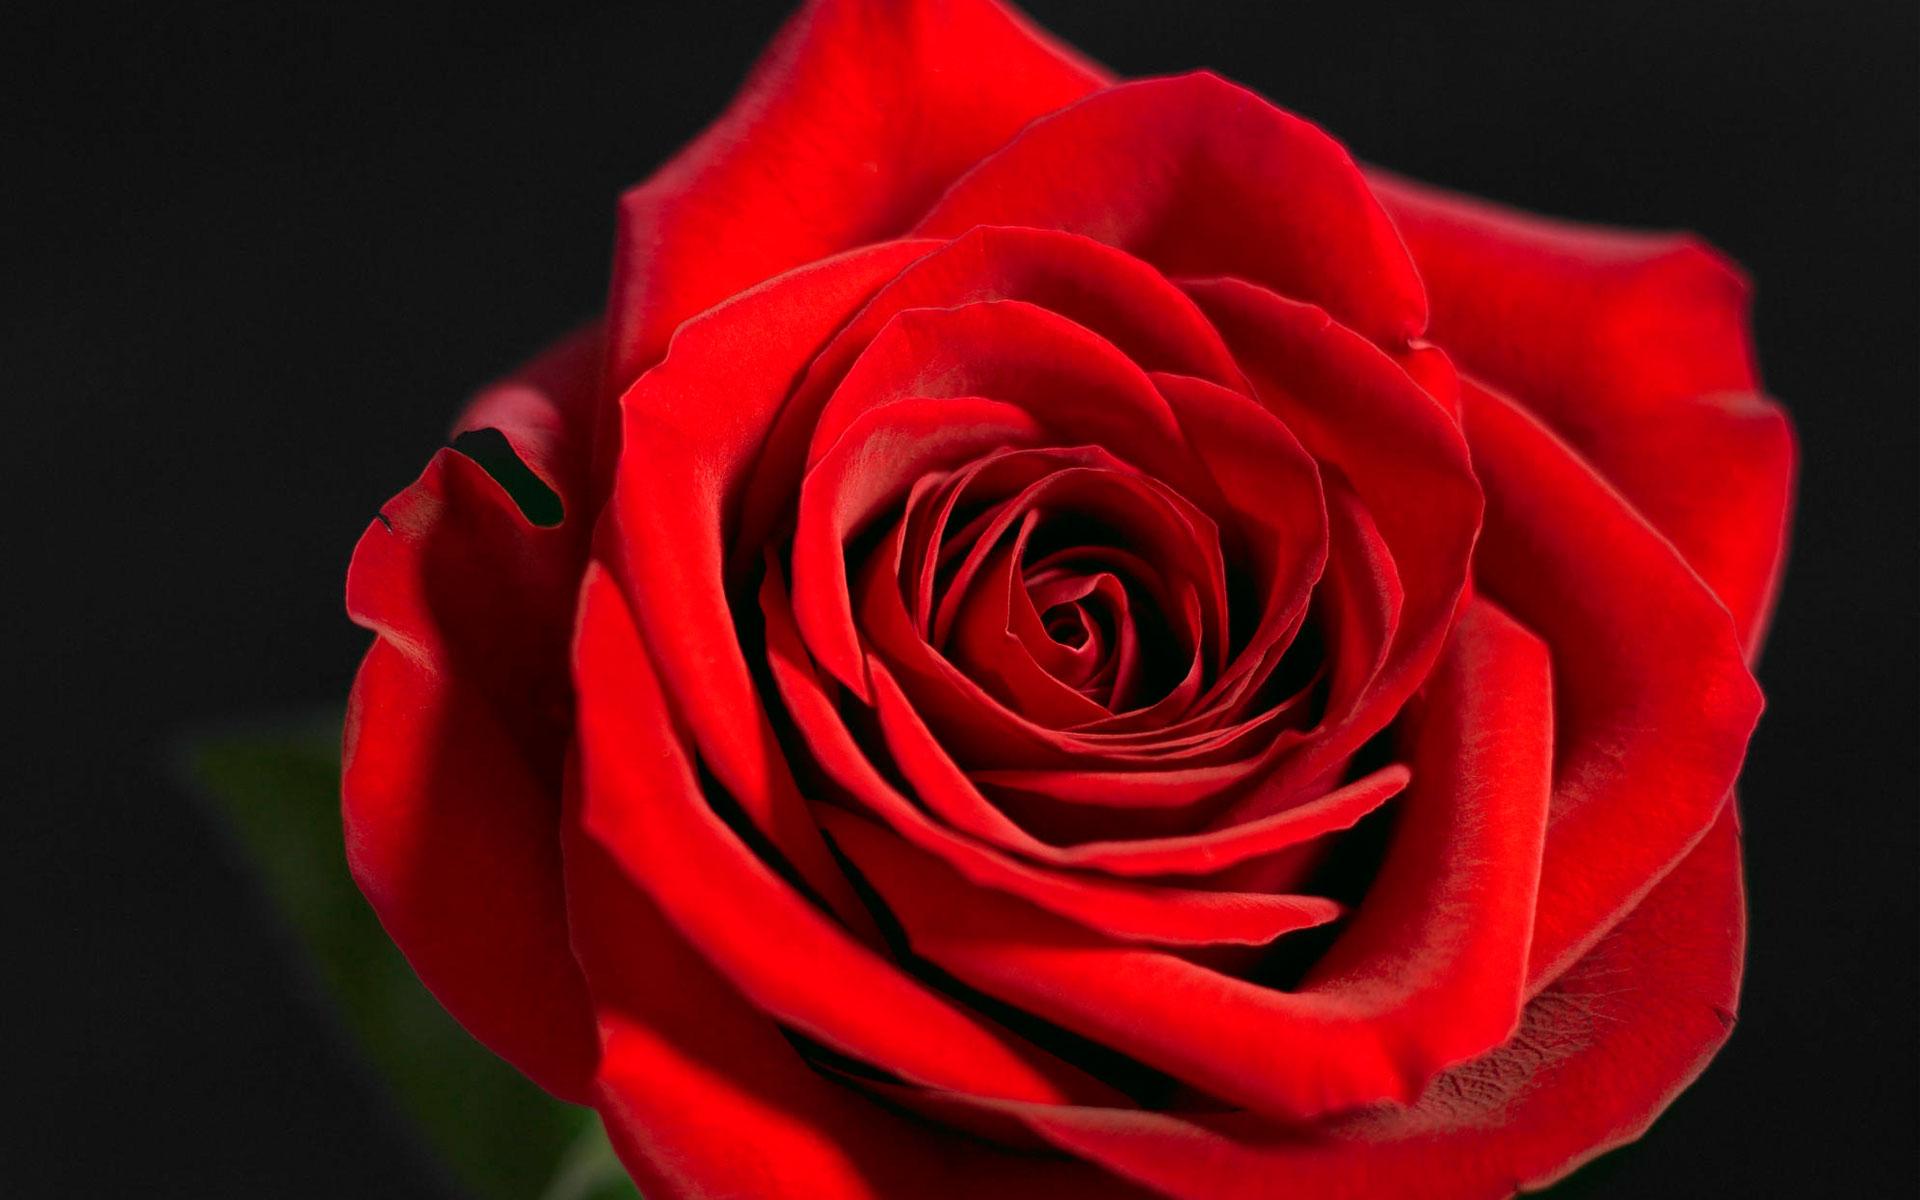 Red Rose Desktop Background   Wallpaper High Definition High Quality 1920x1200